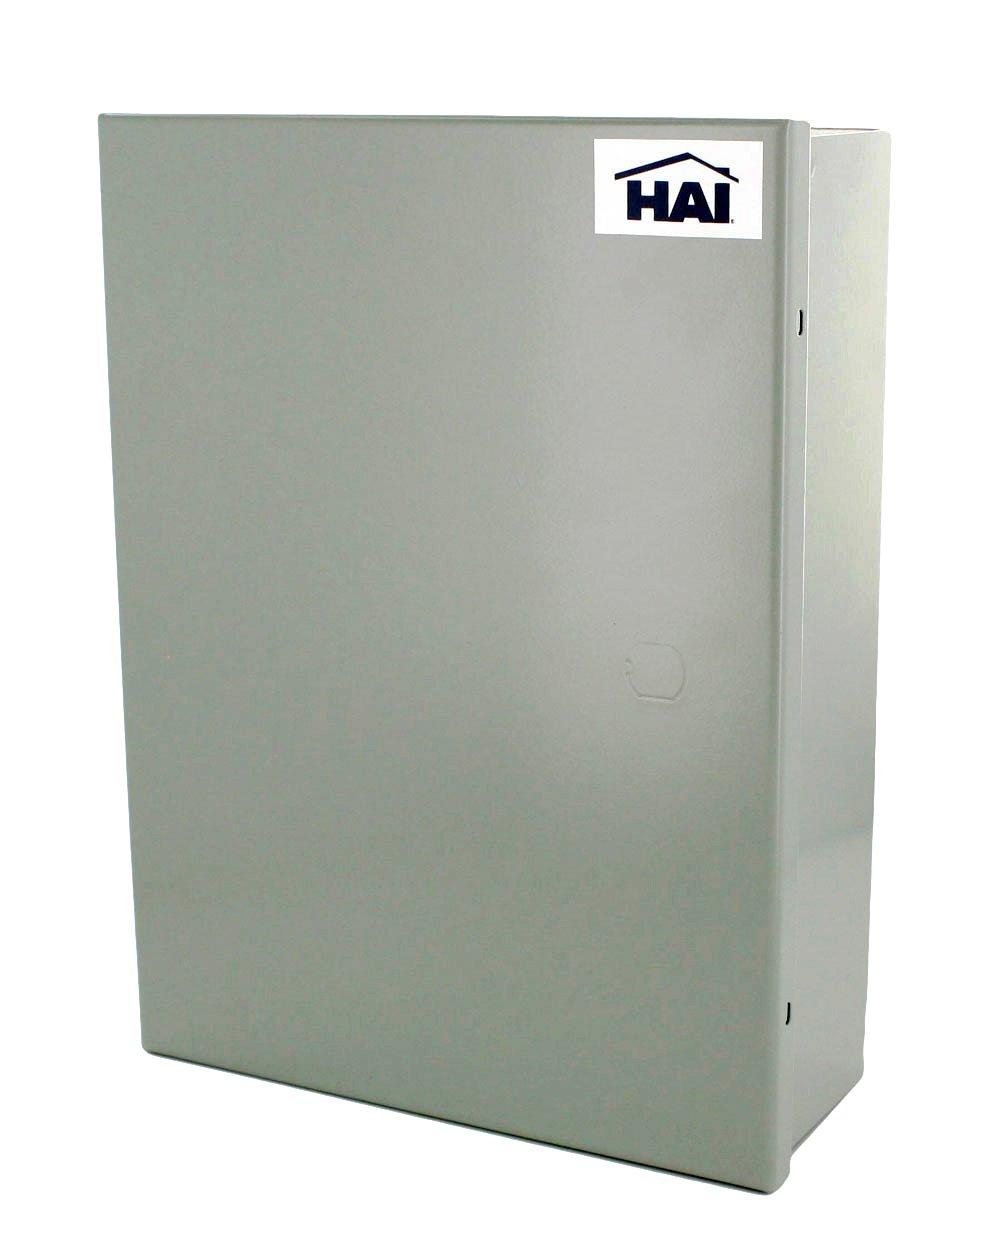 Leviton 83A00-1 Power Hub in Enclosure